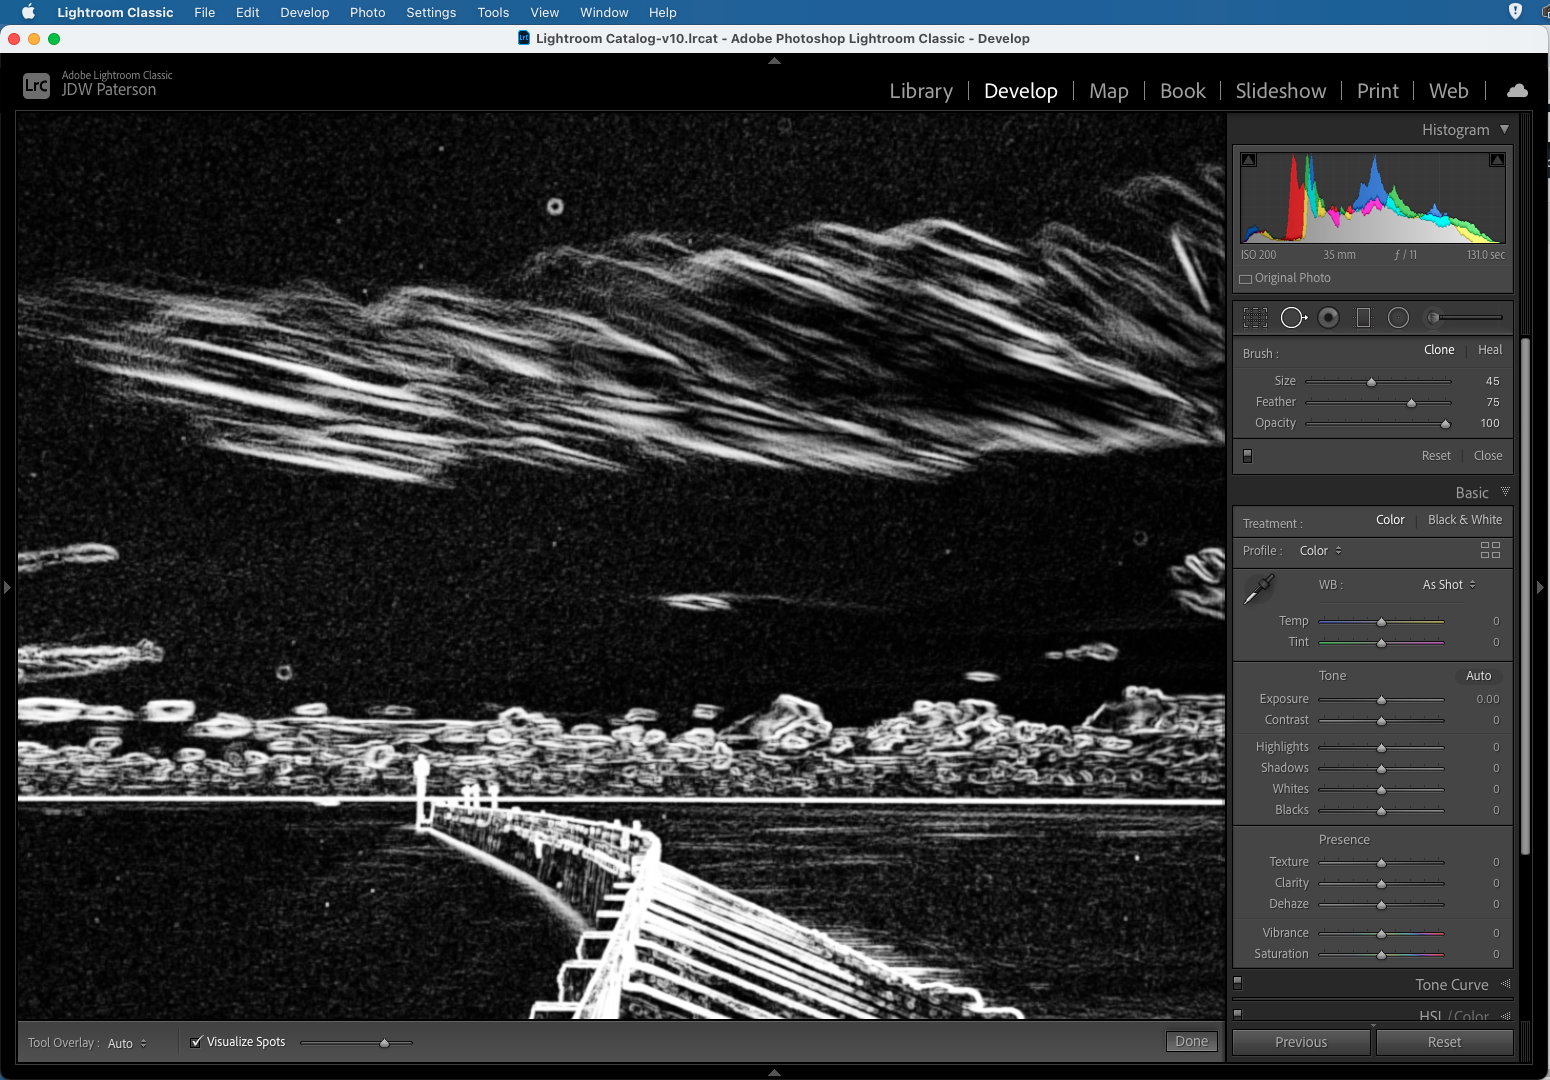 The Visualise Spots as seen in Adobe Lightroom